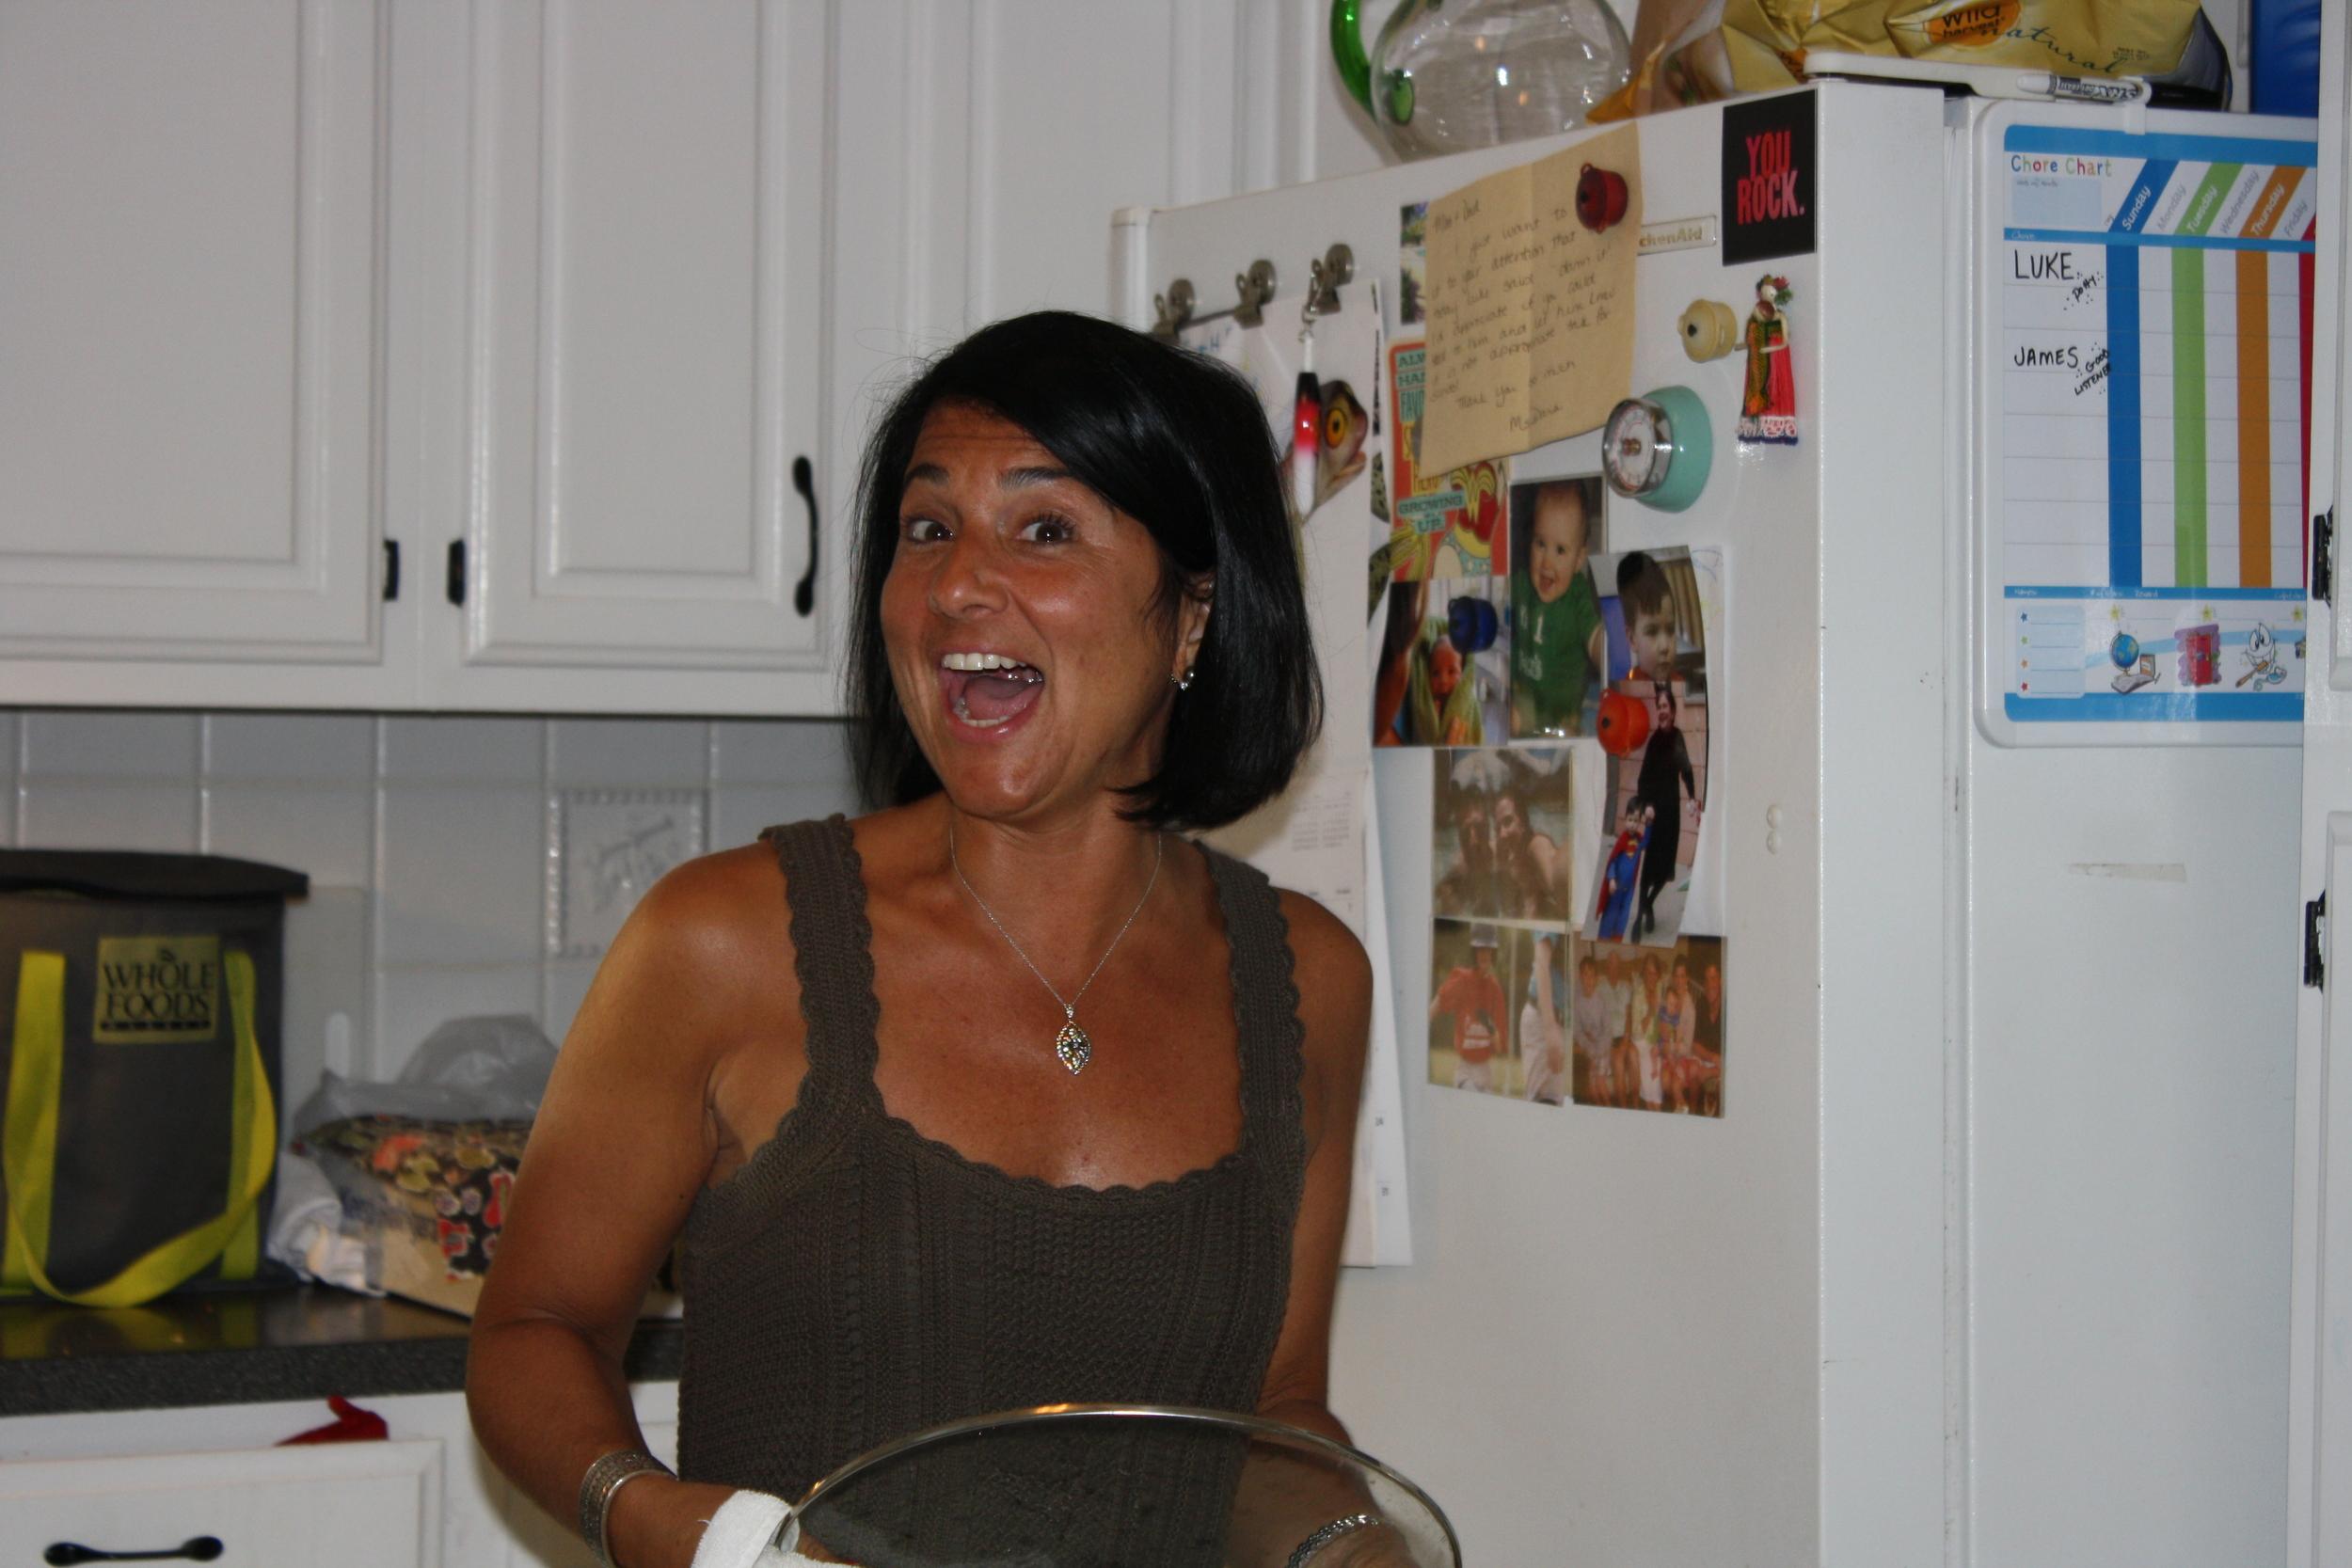 Pam in Kelly's kitchen